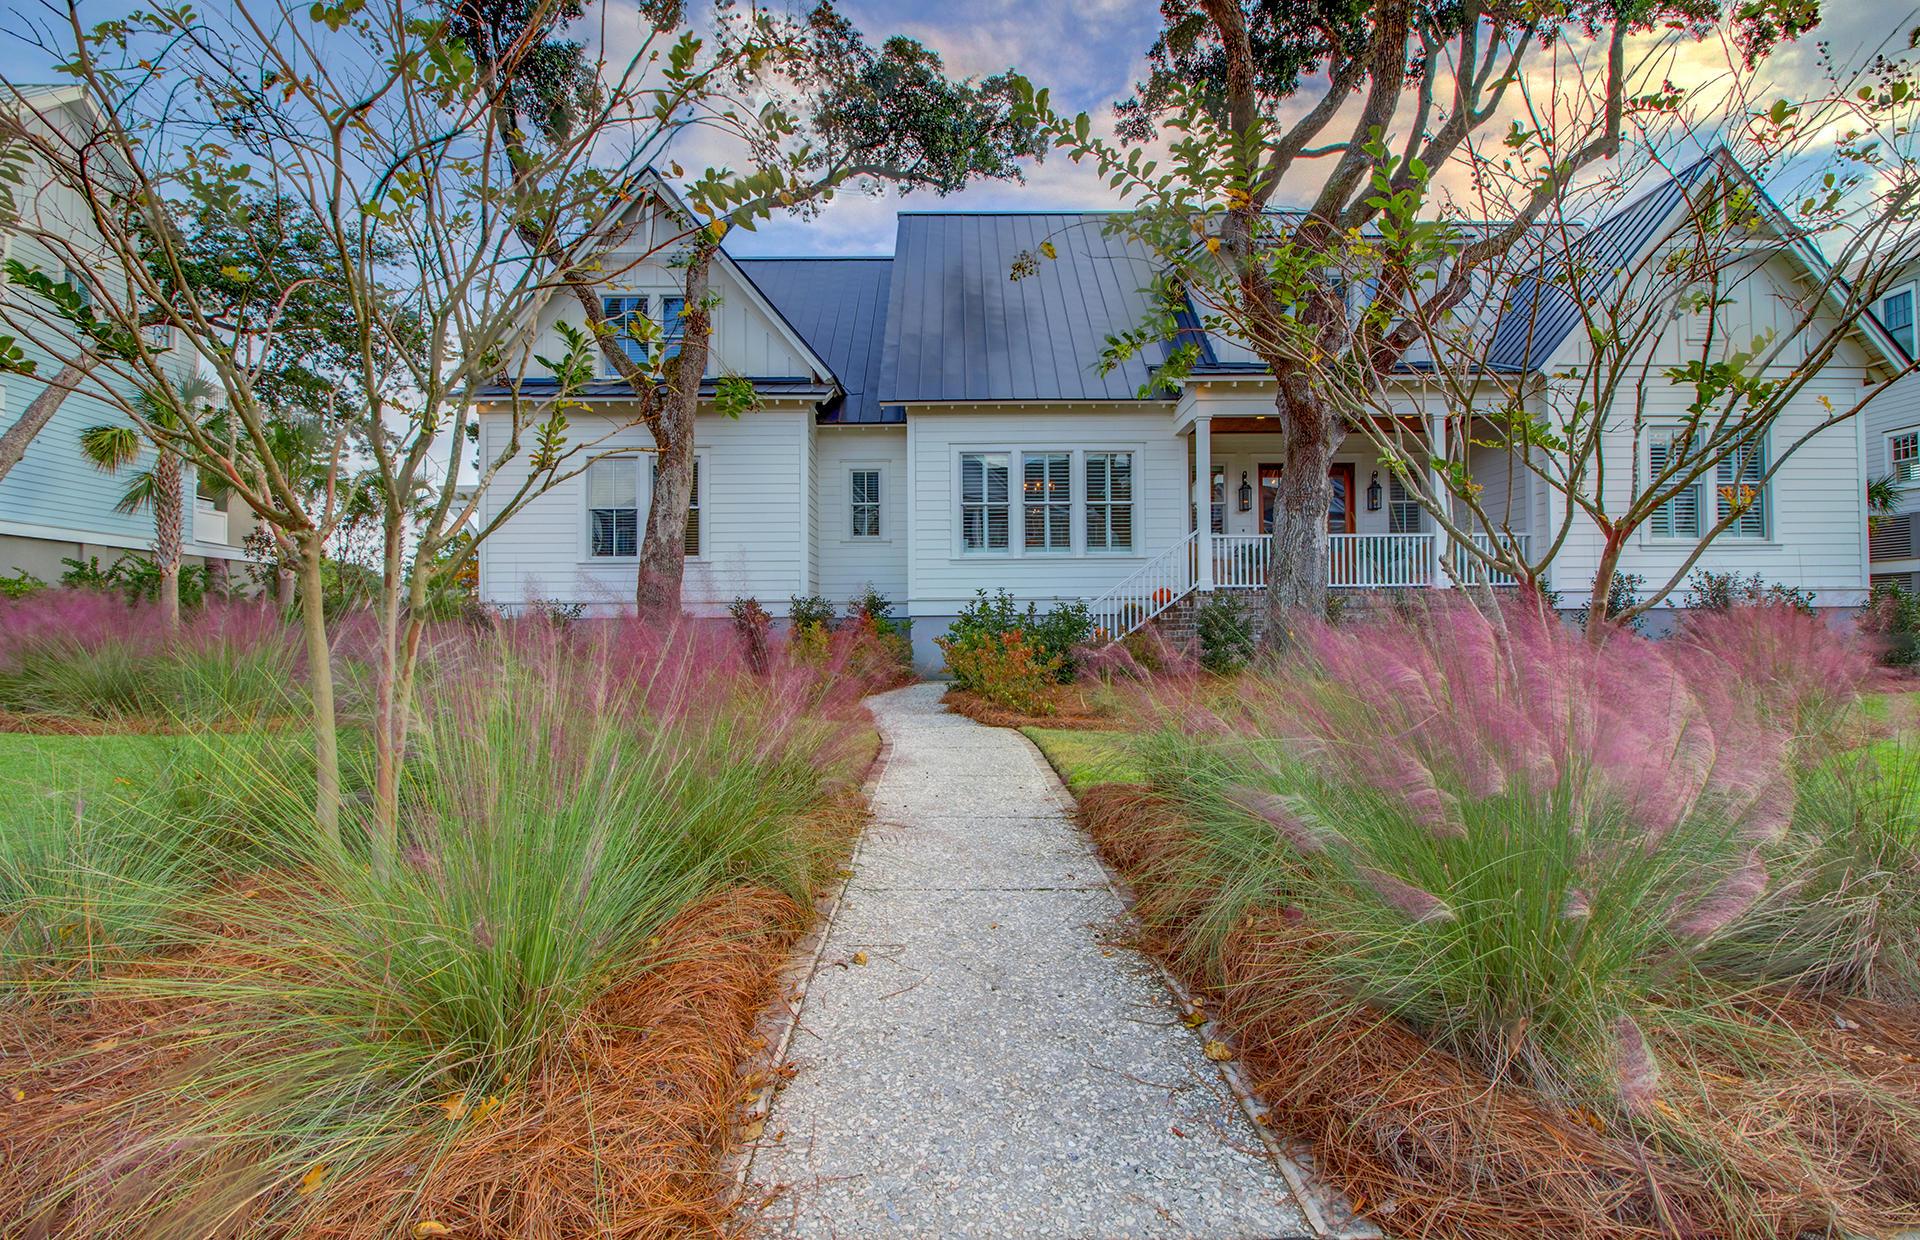 Daniel Island Park Homes For Sale - 117 Brailsford, Charleston, SC - 77